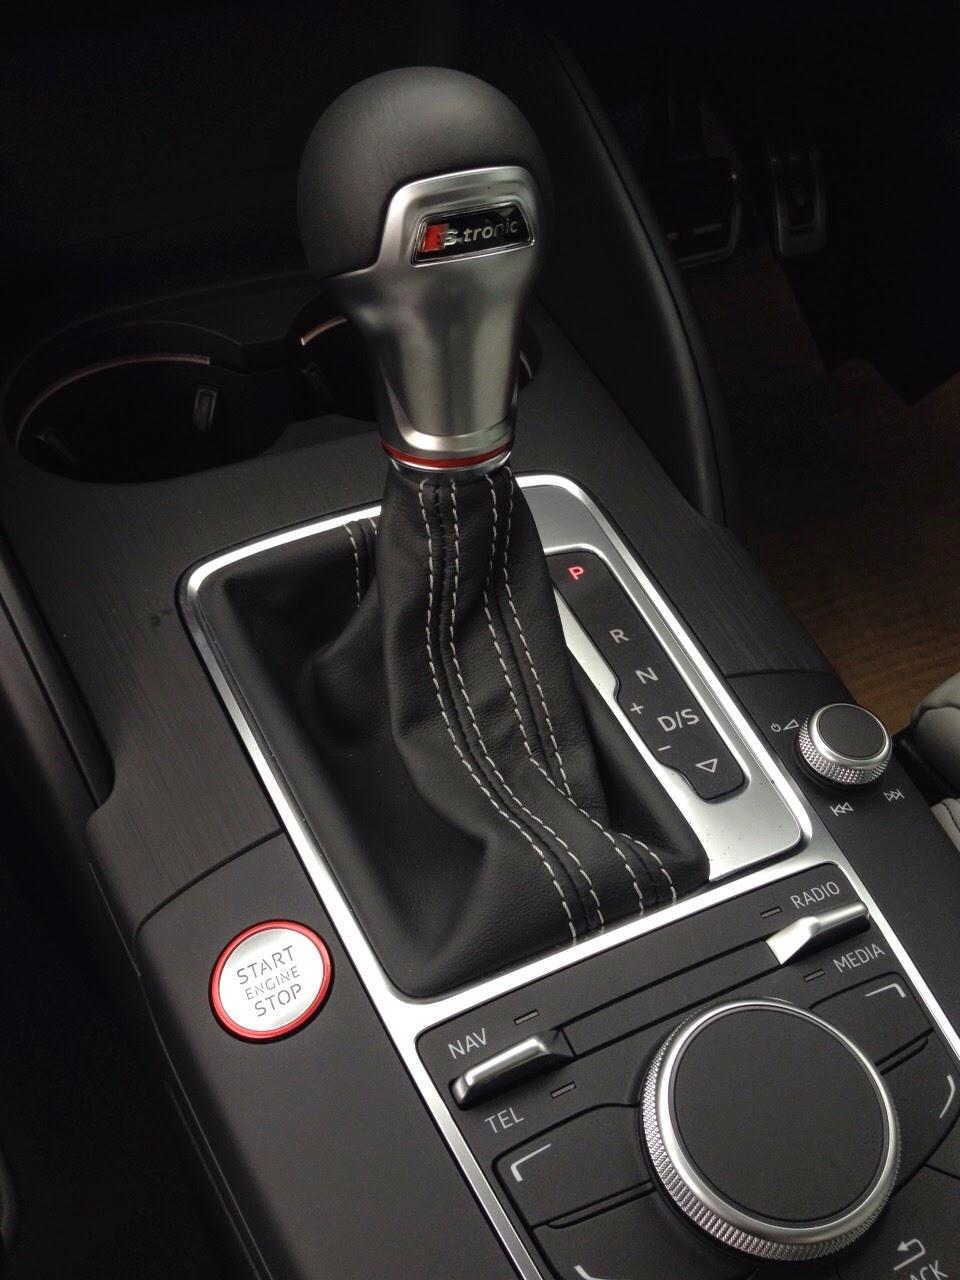 tigerlim com the audi s3 sedan 2 0 tfsi quattro. Black Bedroom Furniture Sets. Home Design Ideas